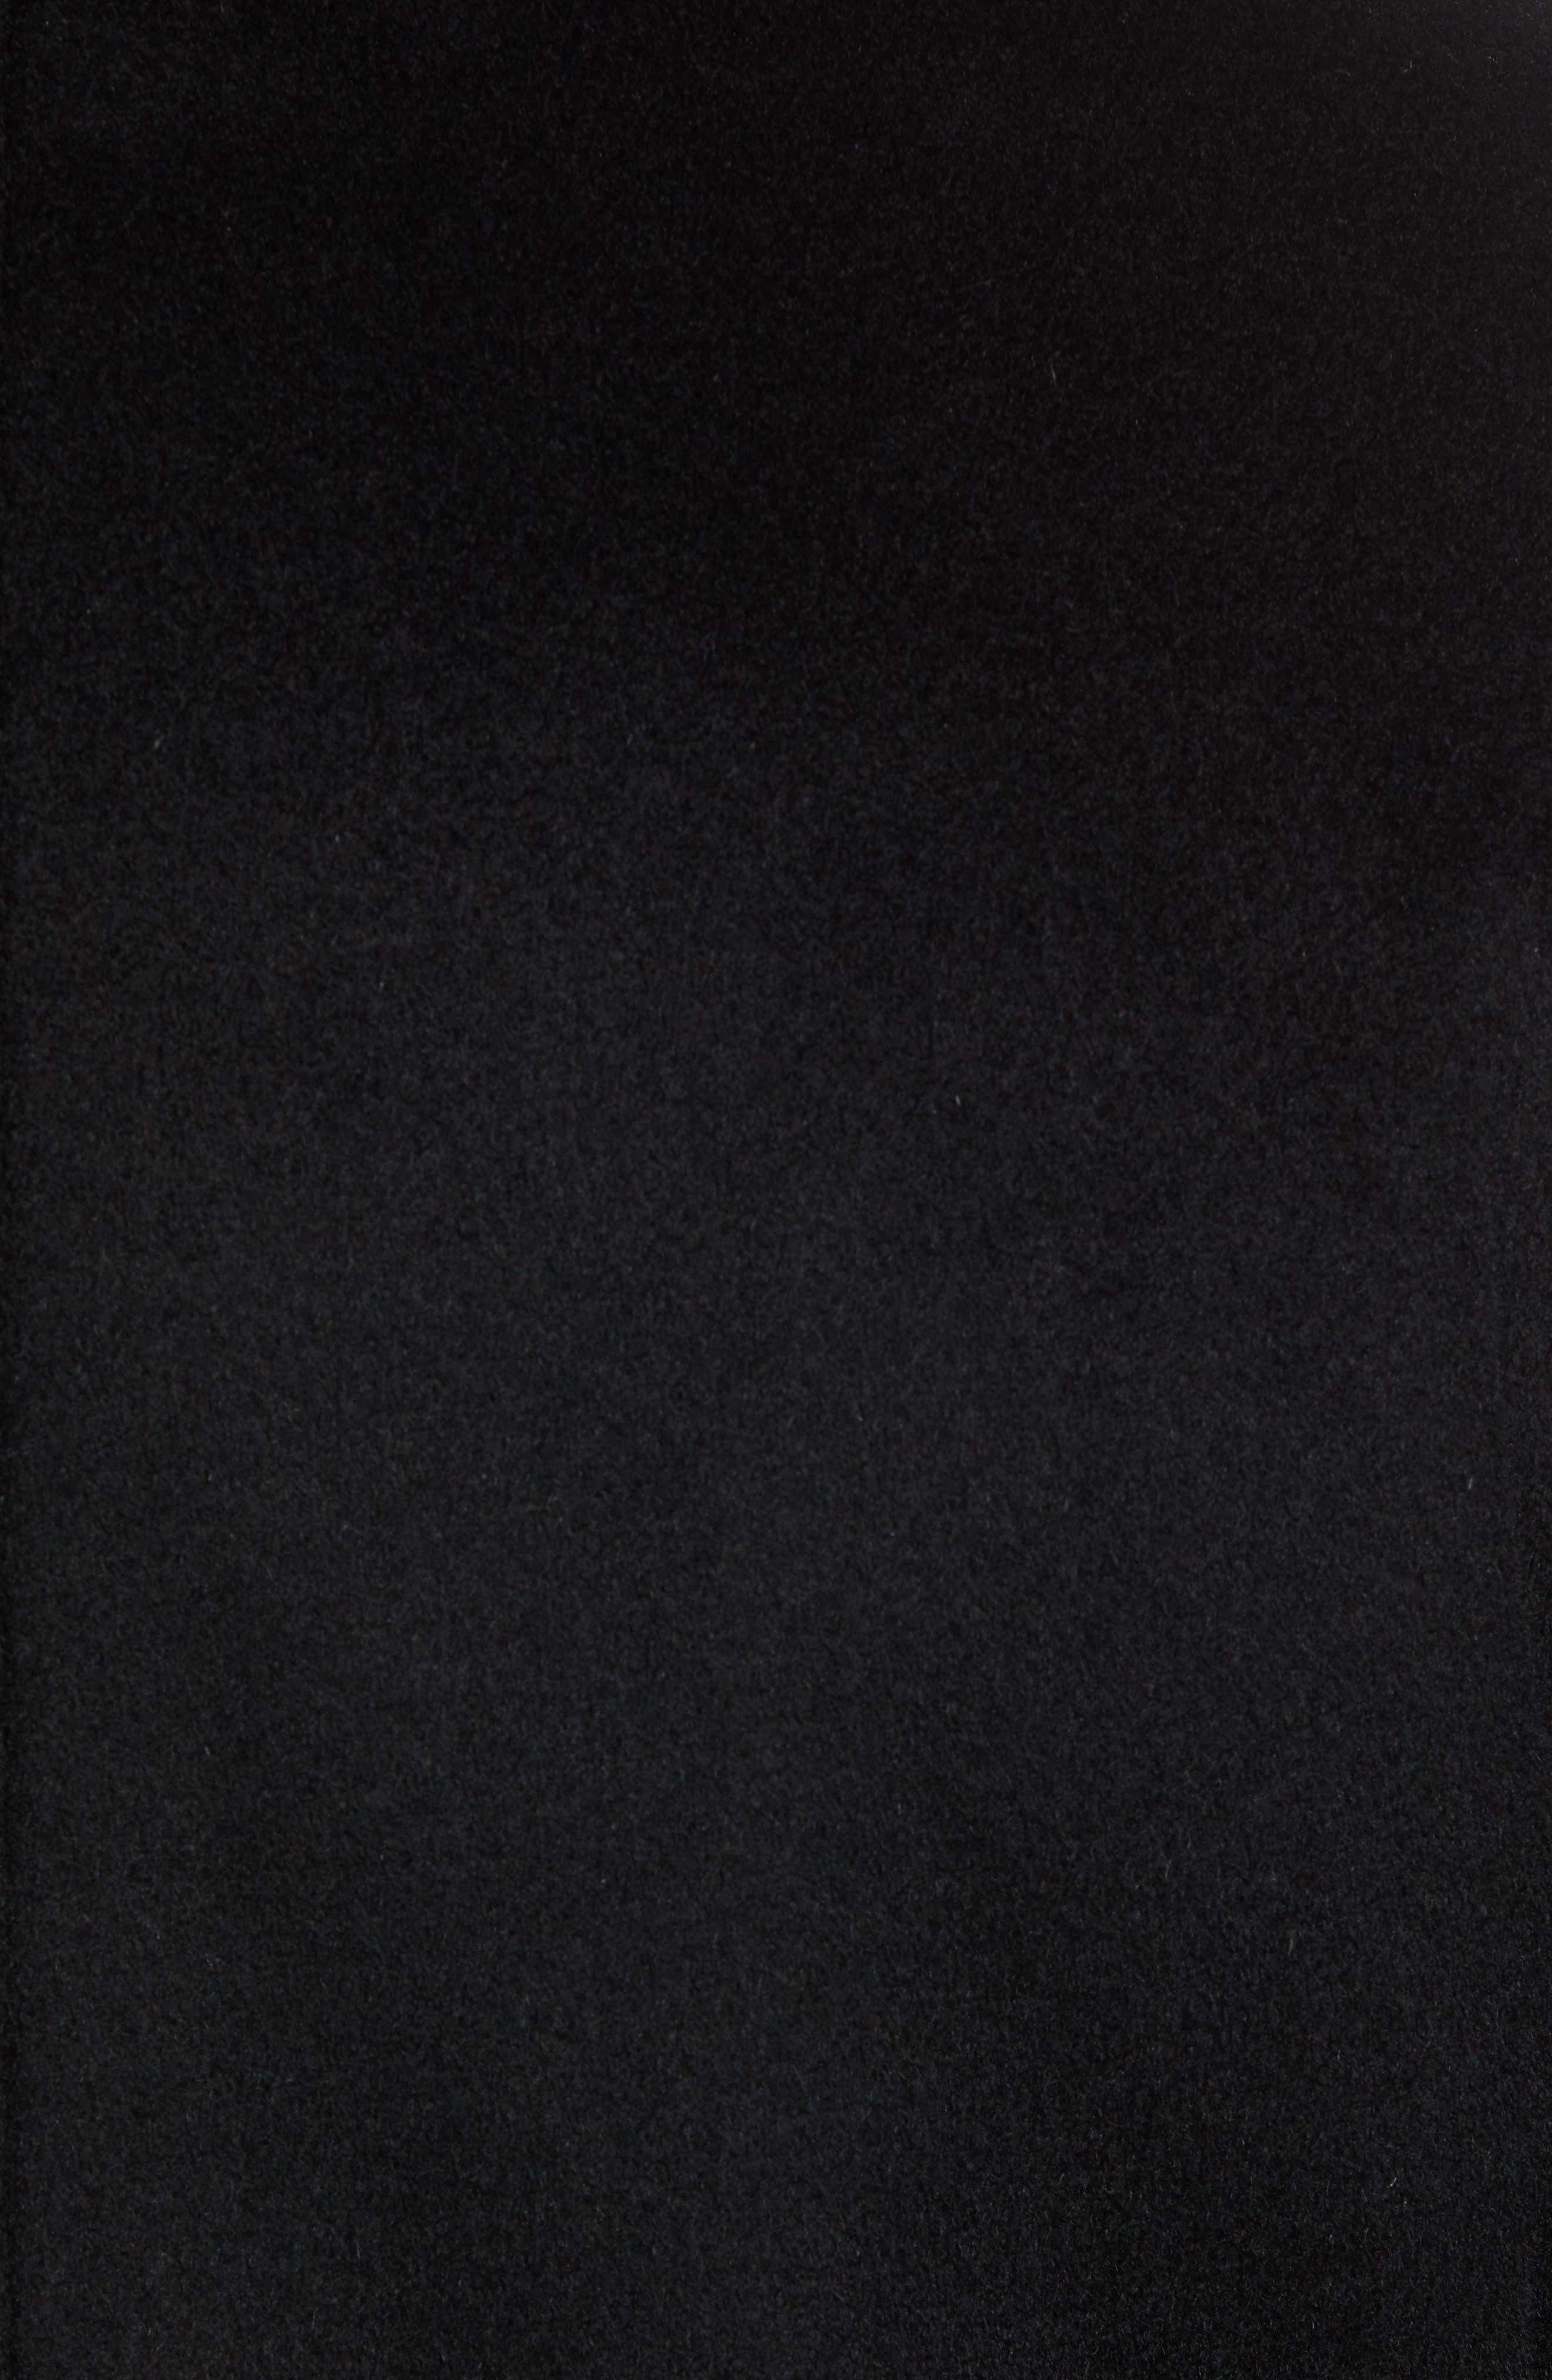 Hudson Wool Car Coat,                             Alternate thumbnail 7, color,                             BLACK